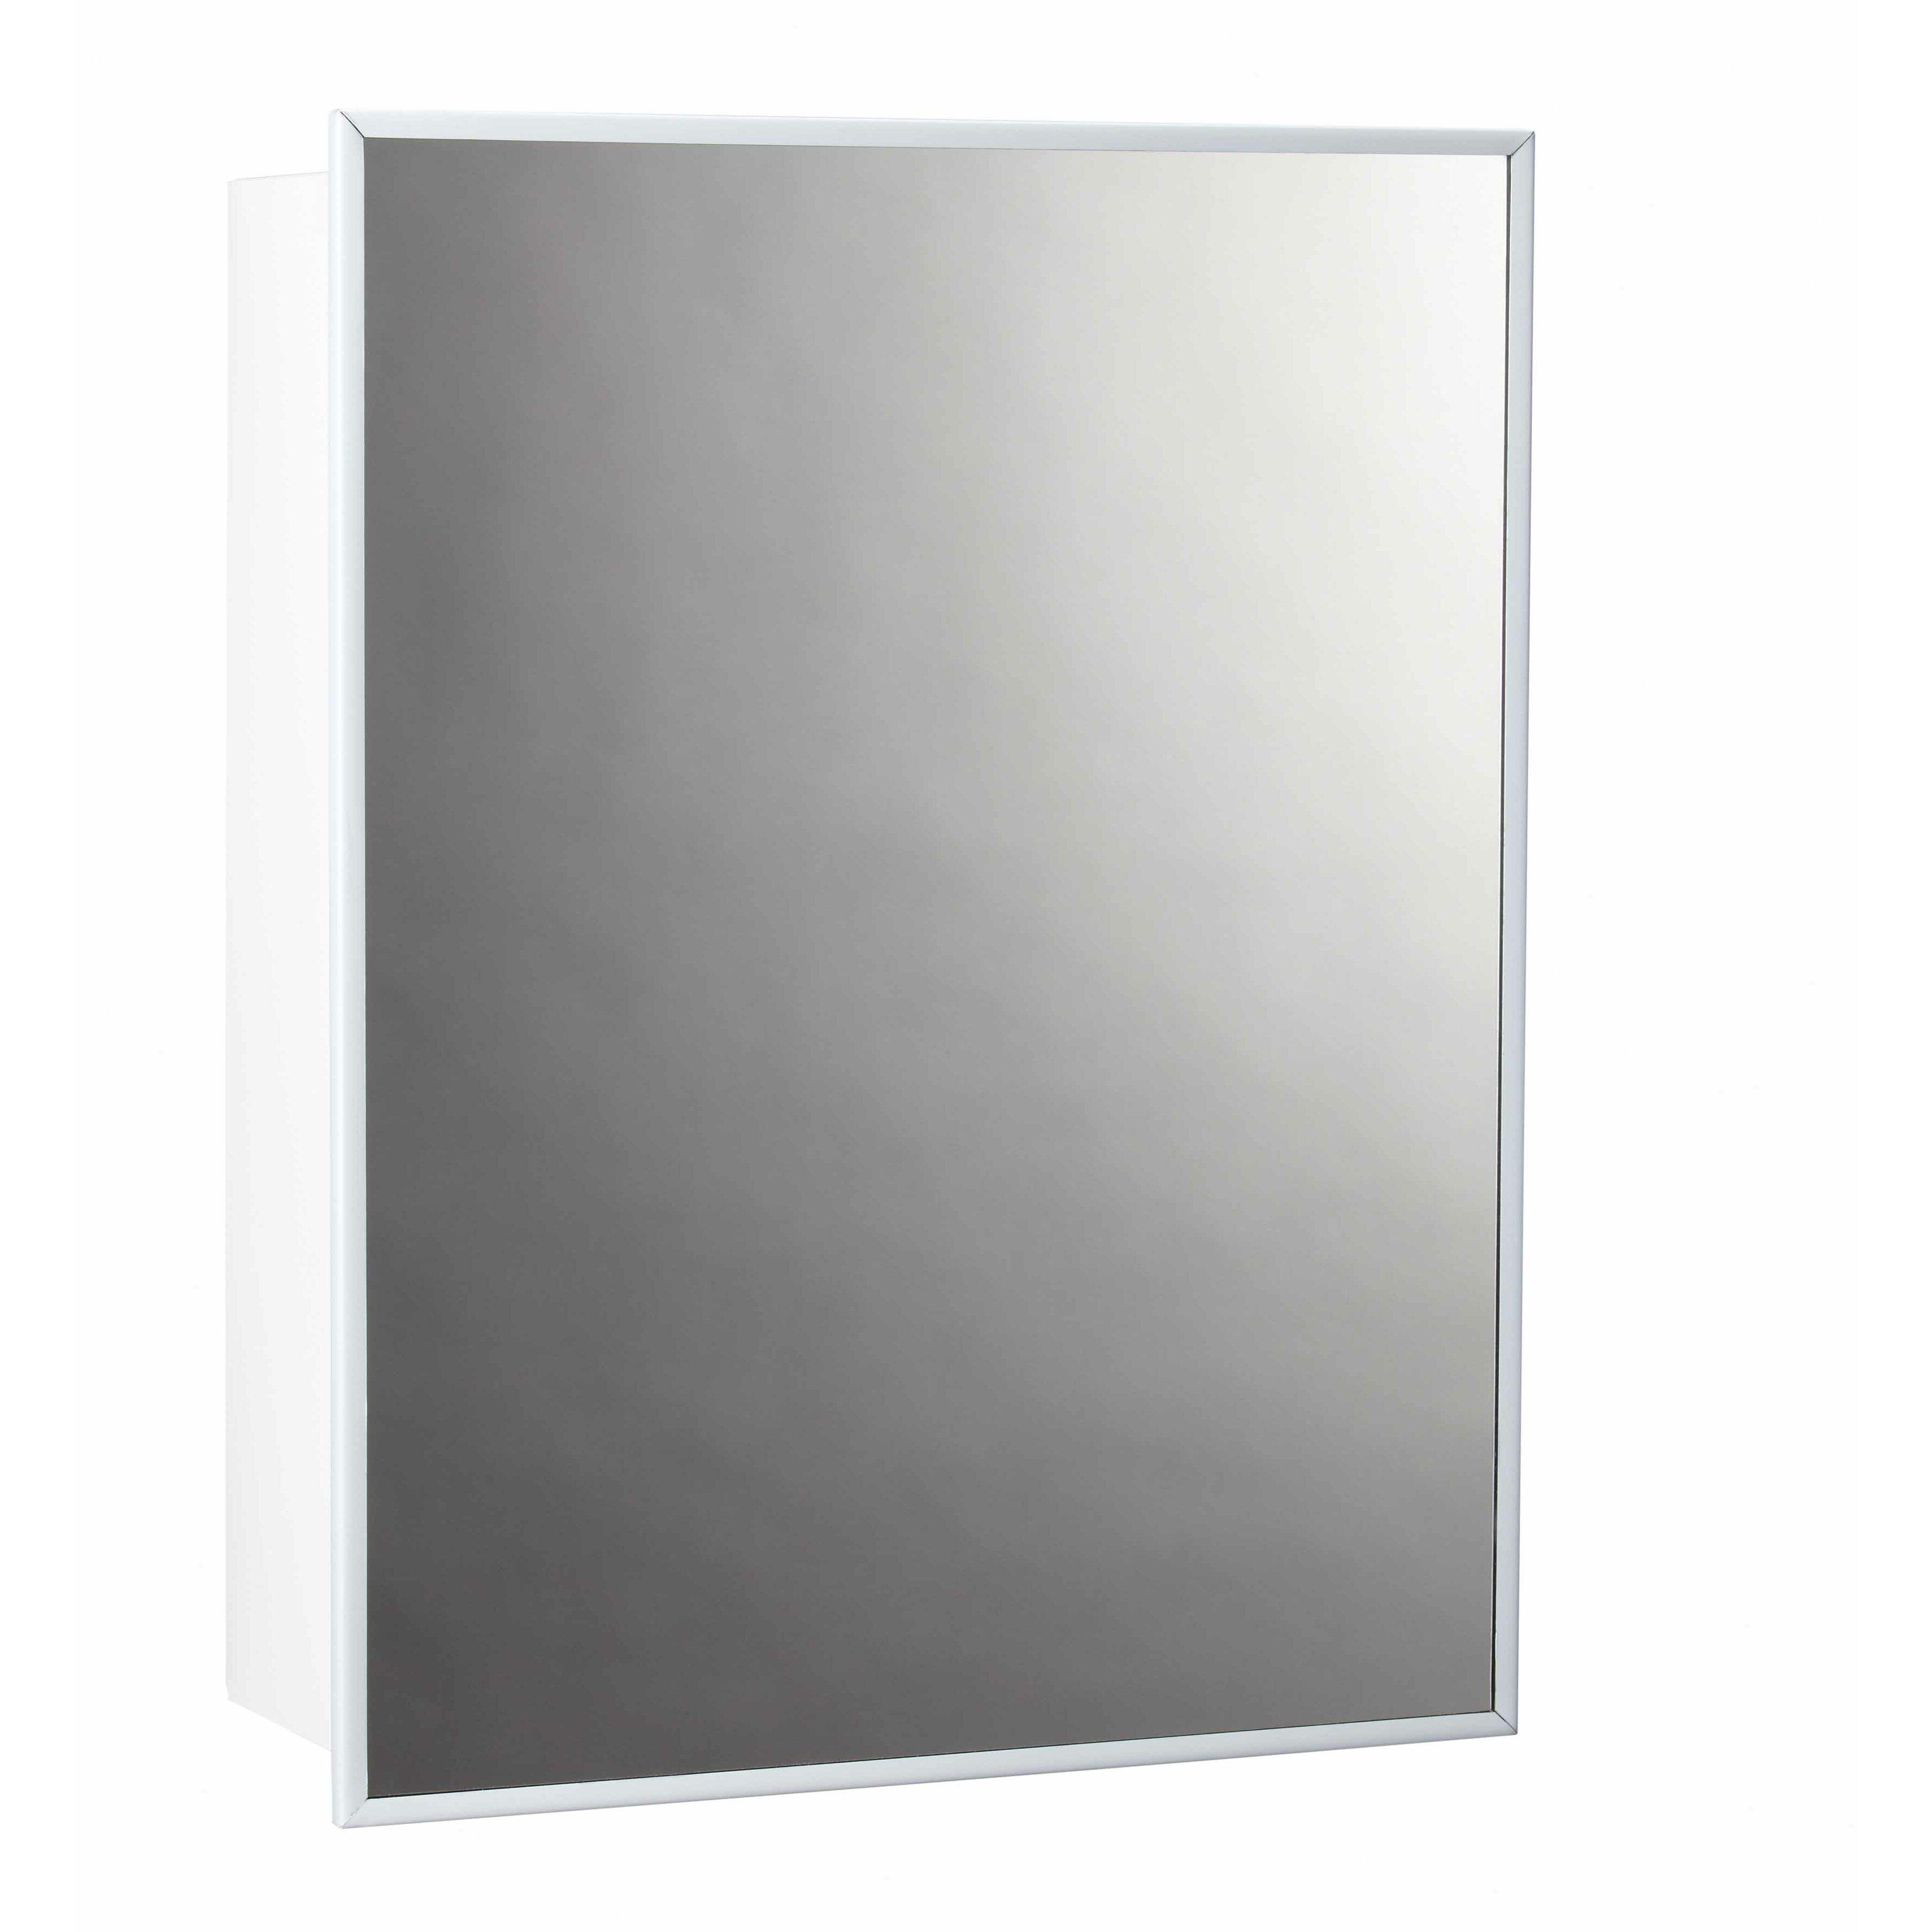 Jensen 14 x 18 surface mount medicine cabinet reviews for Bathroom medicine cabinets 14 x 18